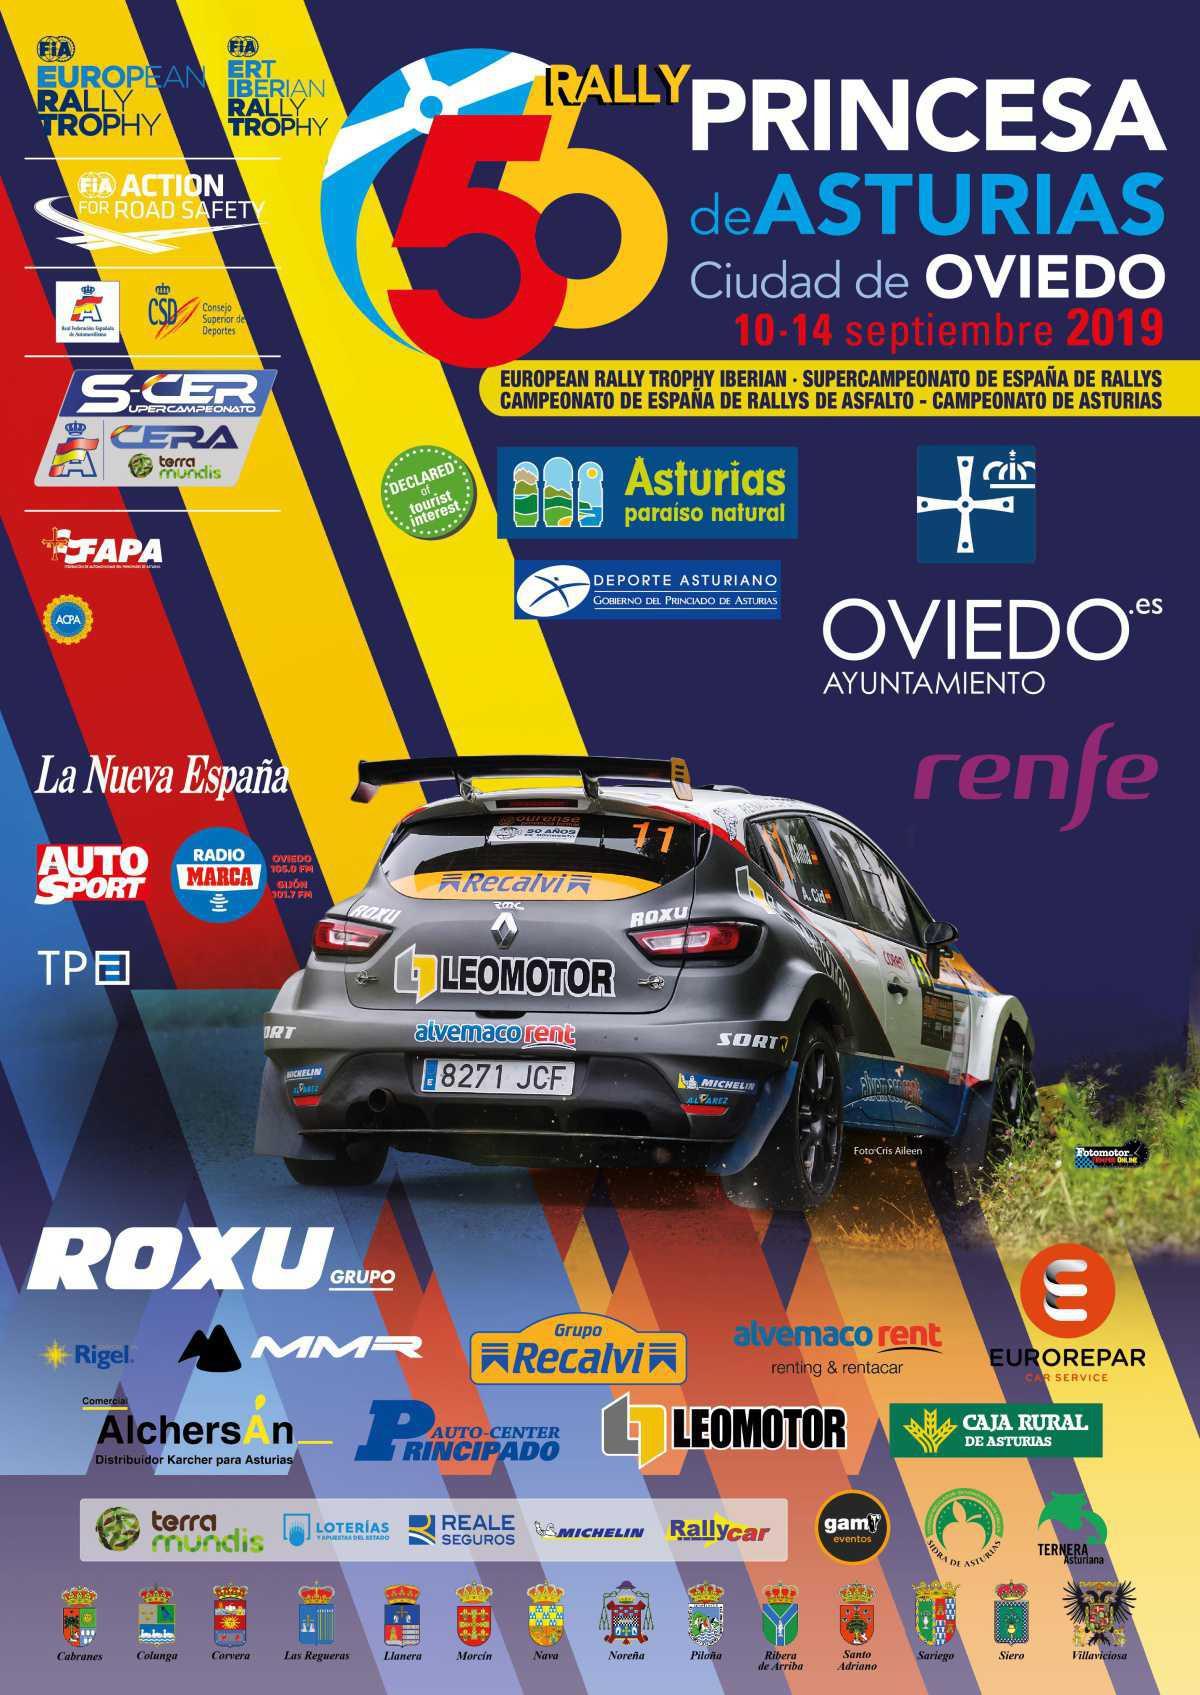 Cartel Oficial 56 Rally Princesa de Asturias - Ciudad de Oviedo